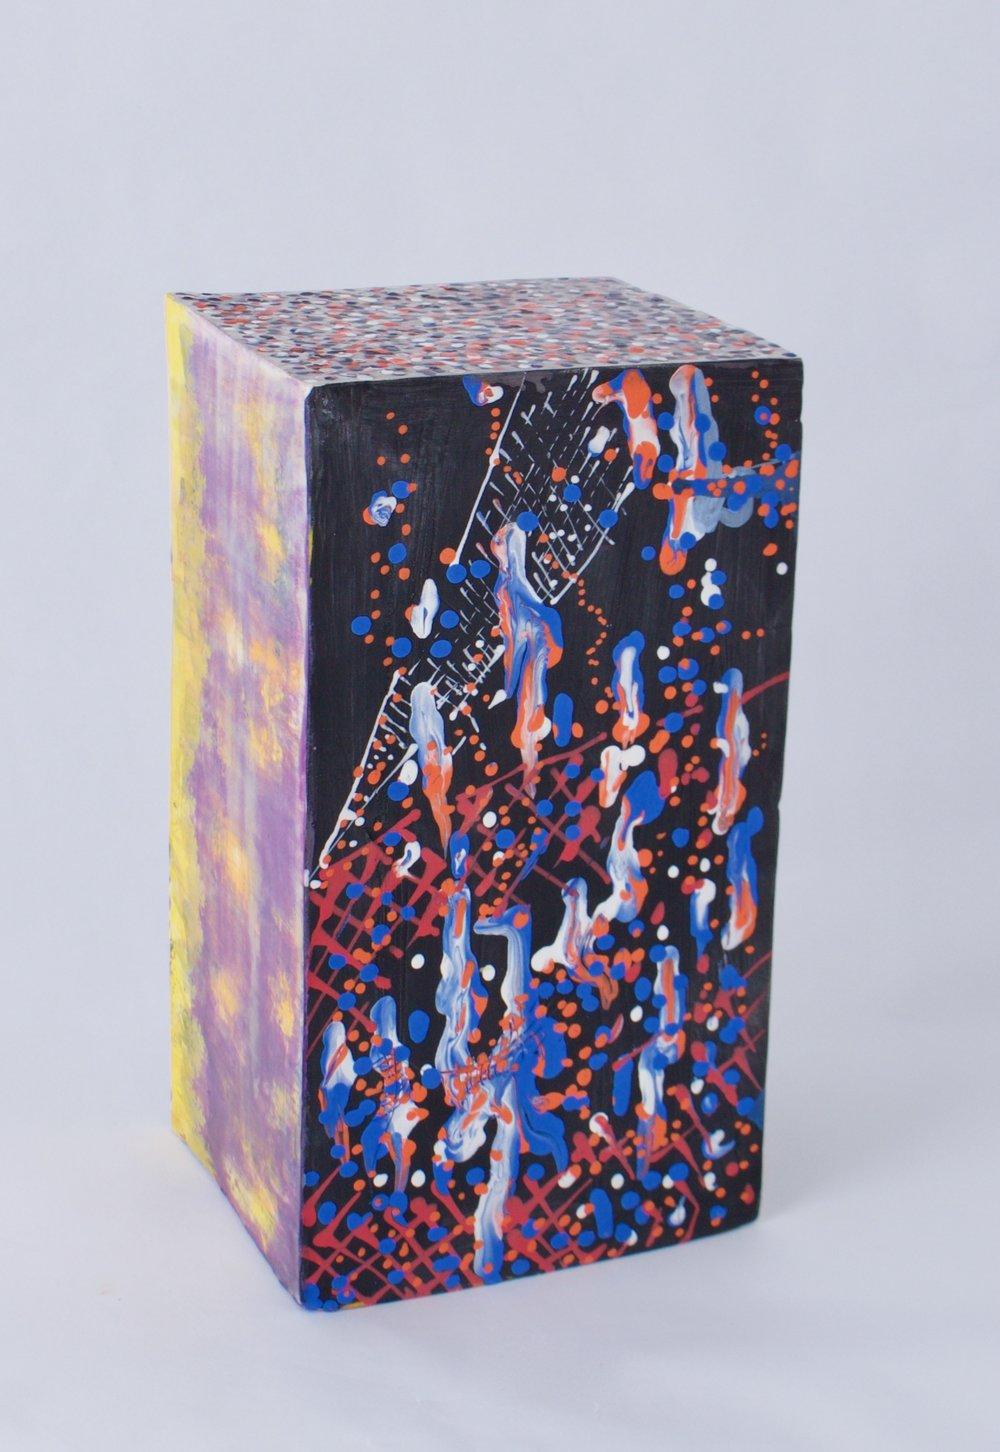 Perspective Projection 3,   Stoneware, underglaze, glaze, 10.5 x 5.5 x 5 inches, 2016